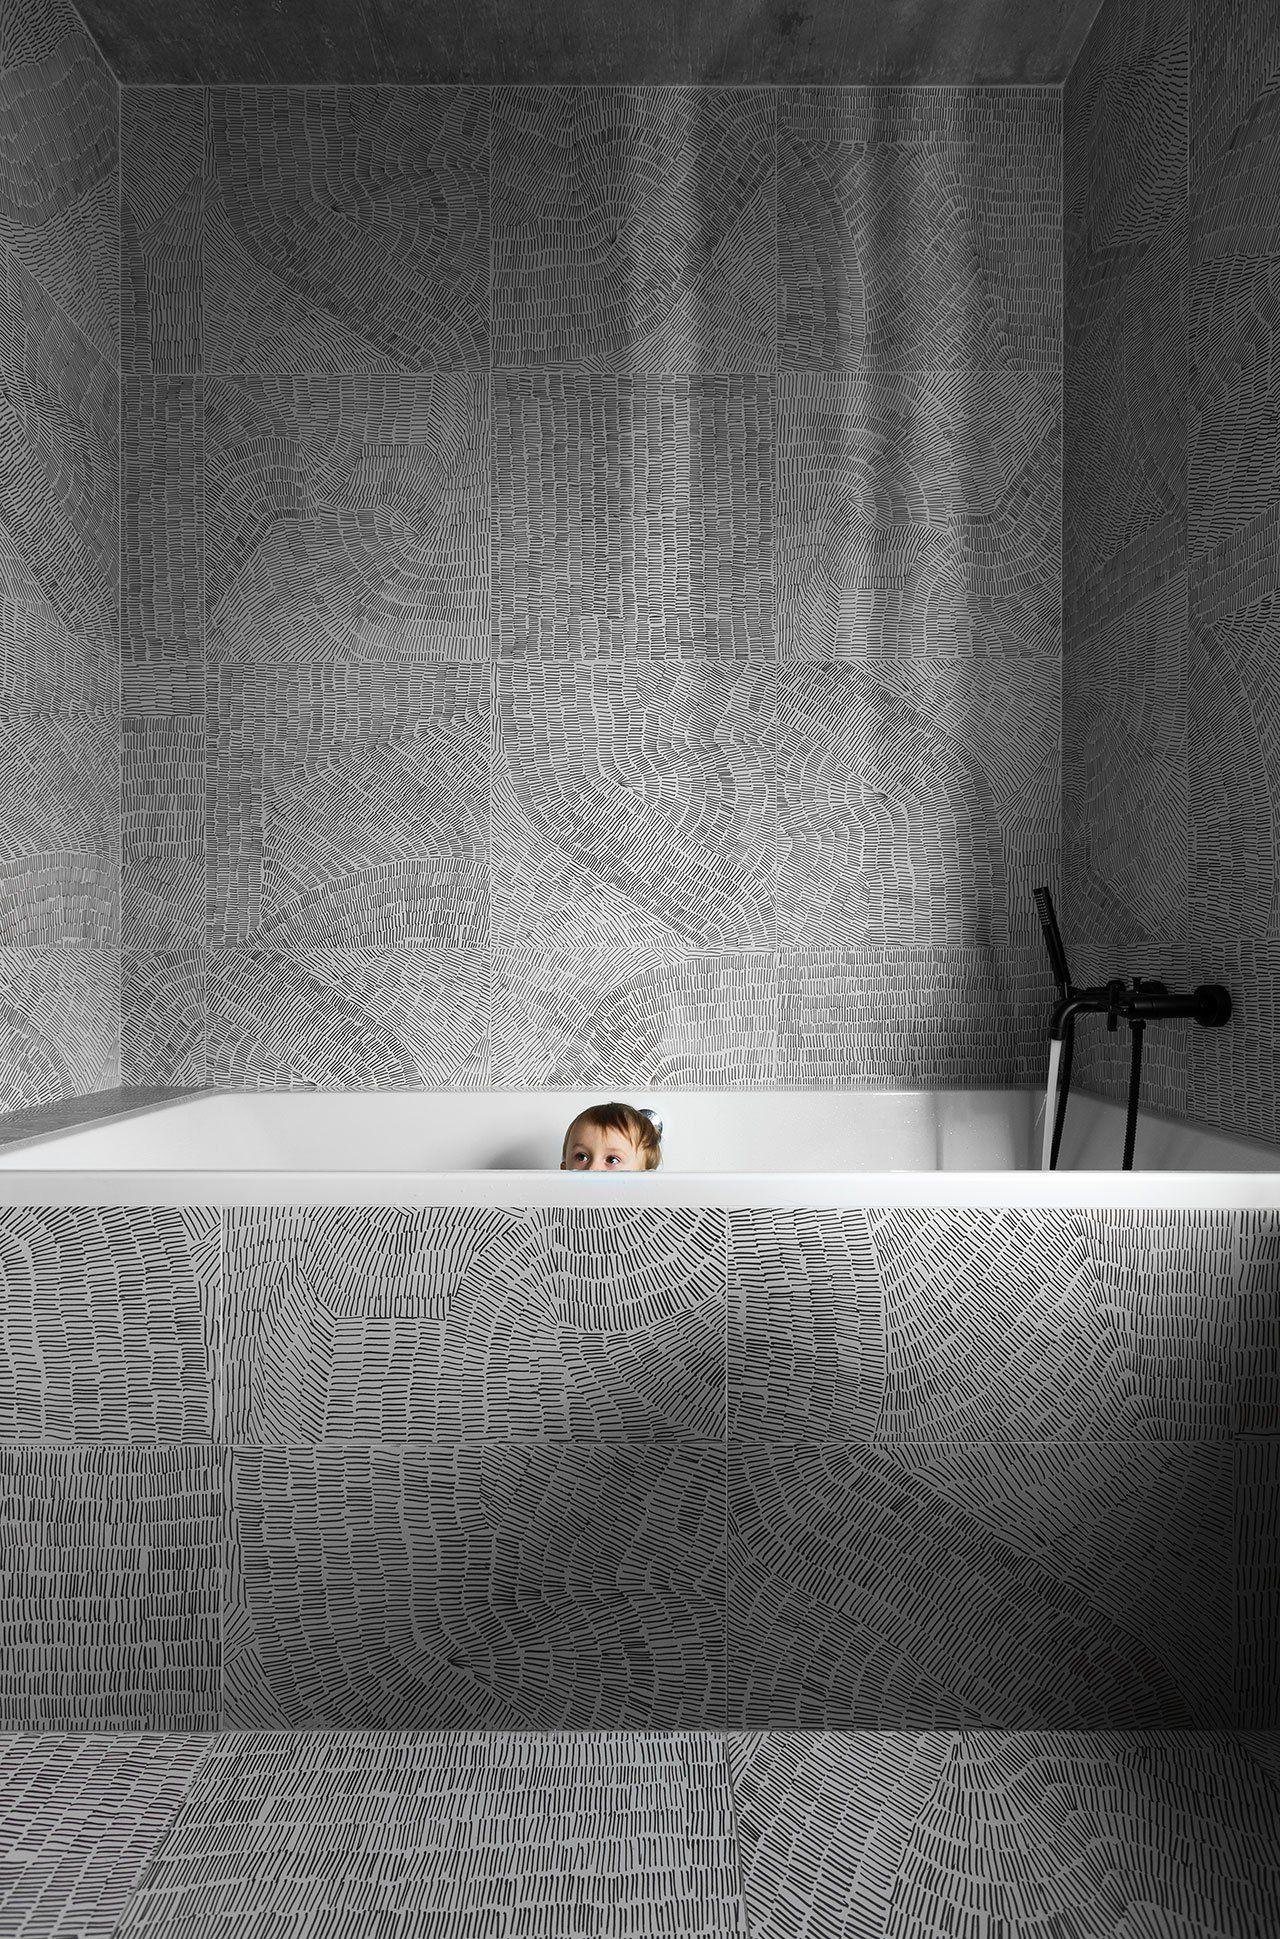 Badezimmerdesign 7 x 5 imperfection is beautiful the wabi sabi apartment by sergey makhno